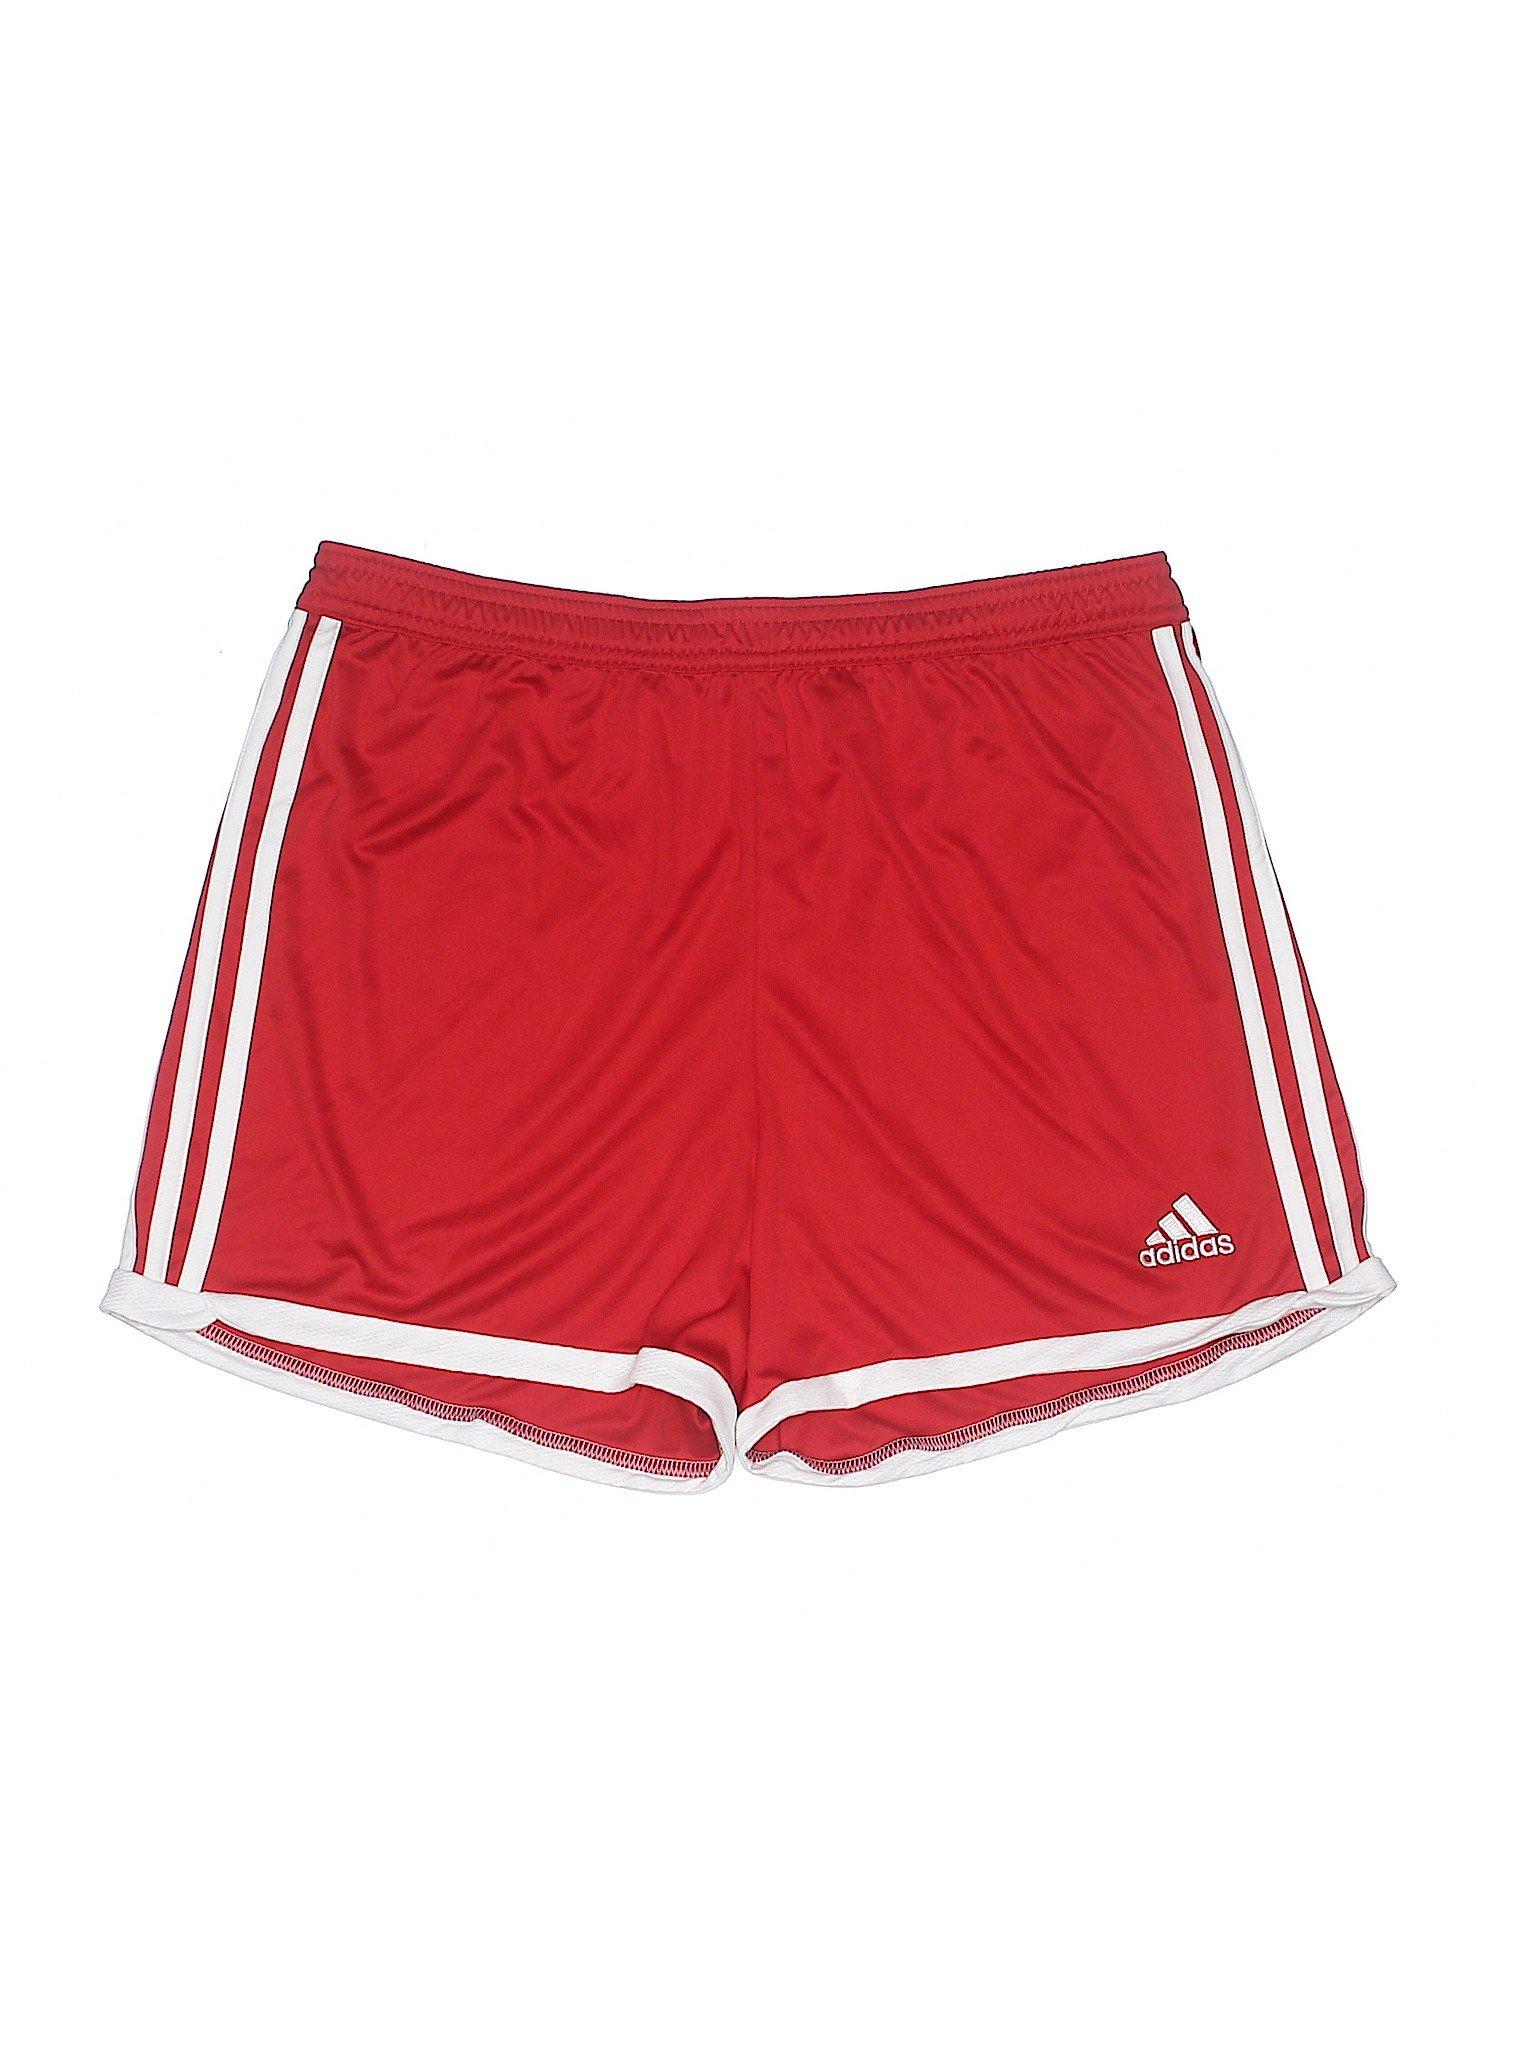 Leisure winter Adidas Adidas Shorts Leisure Athletic Athletic winter TfqTr